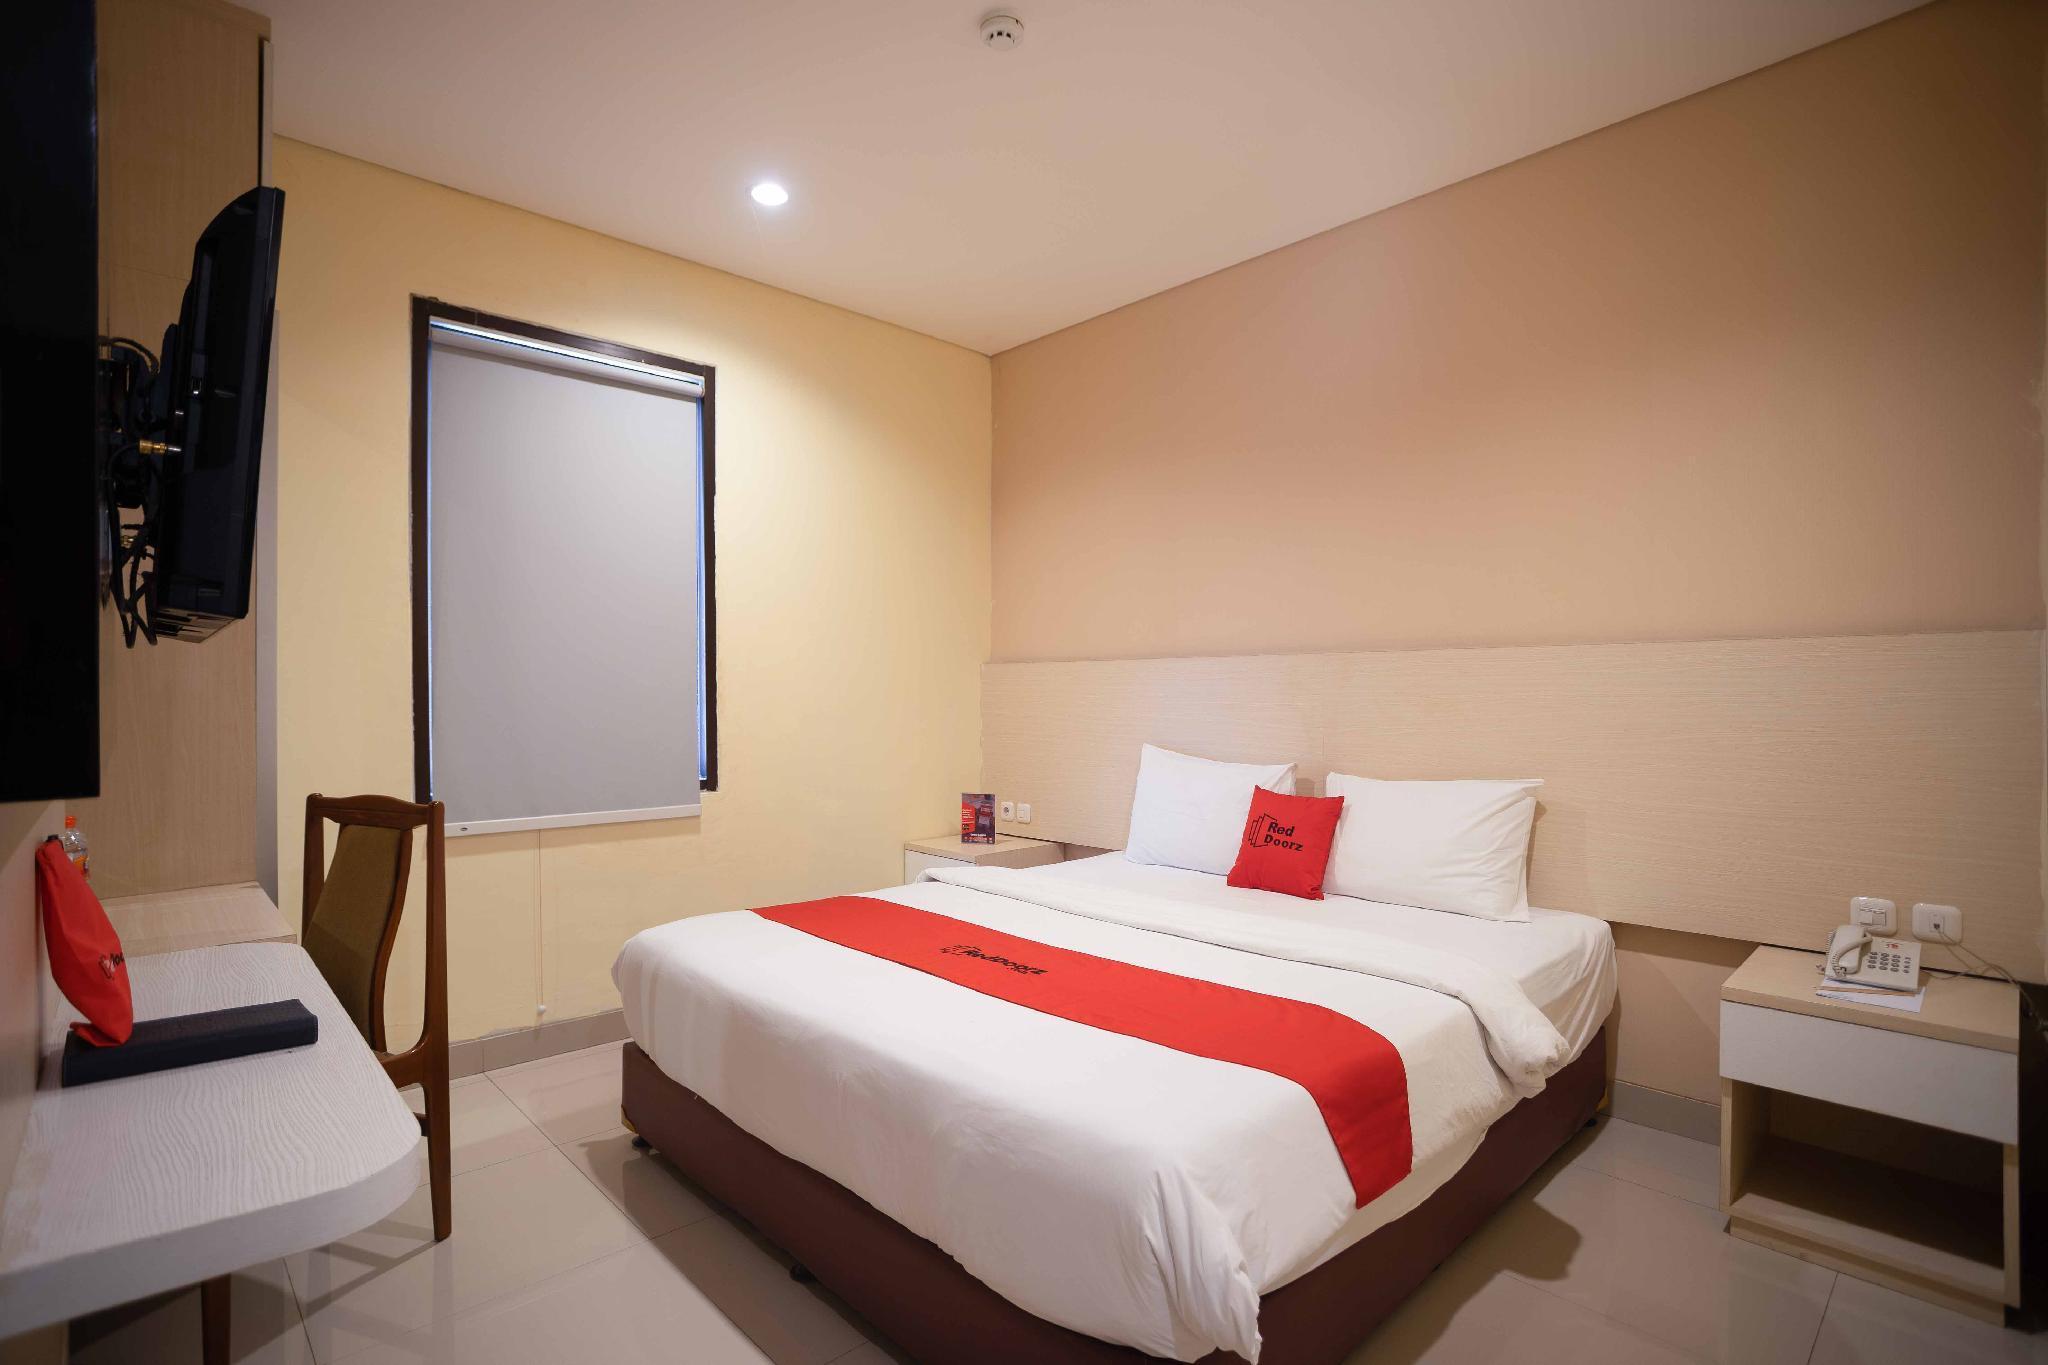 RedDoorz Premium near Kawasan Industri Cikarang Reviews